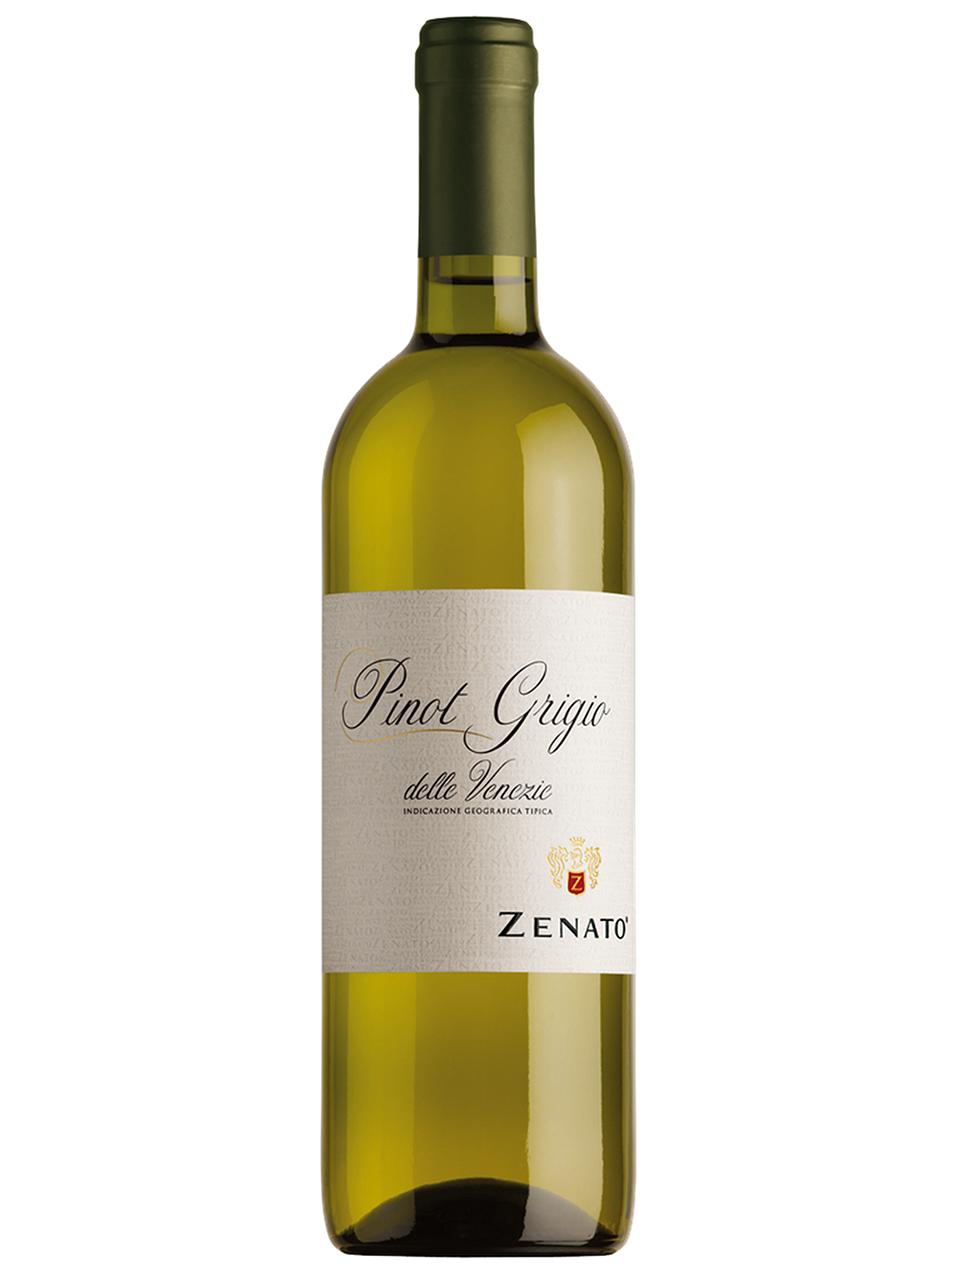 Zenato Pinot Grigio delle Venezie IGT